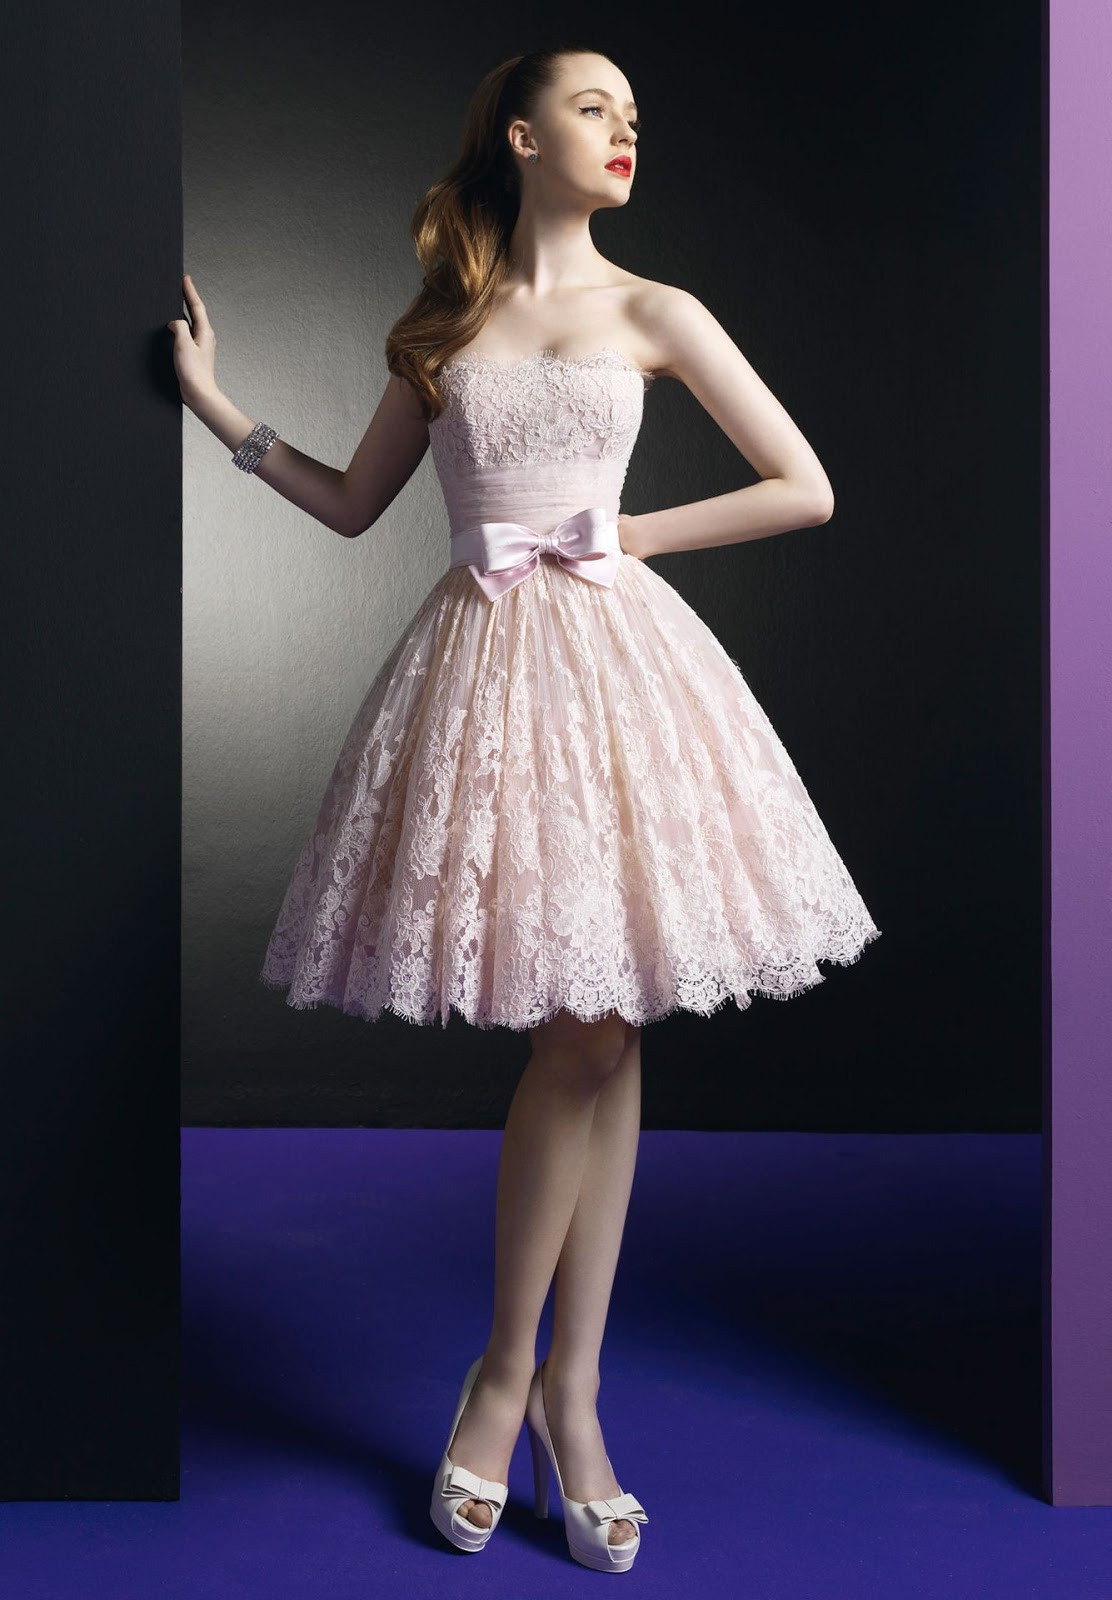 http://2.bp.blogspot.com/-Z2h7TMe4YDk/UH0Vx0O-KfI/AAAAAAAAAqU/1YqYxKSo9Bc/s1600/lace-strapless-ball-gown-short-cocktail-dress.jpg